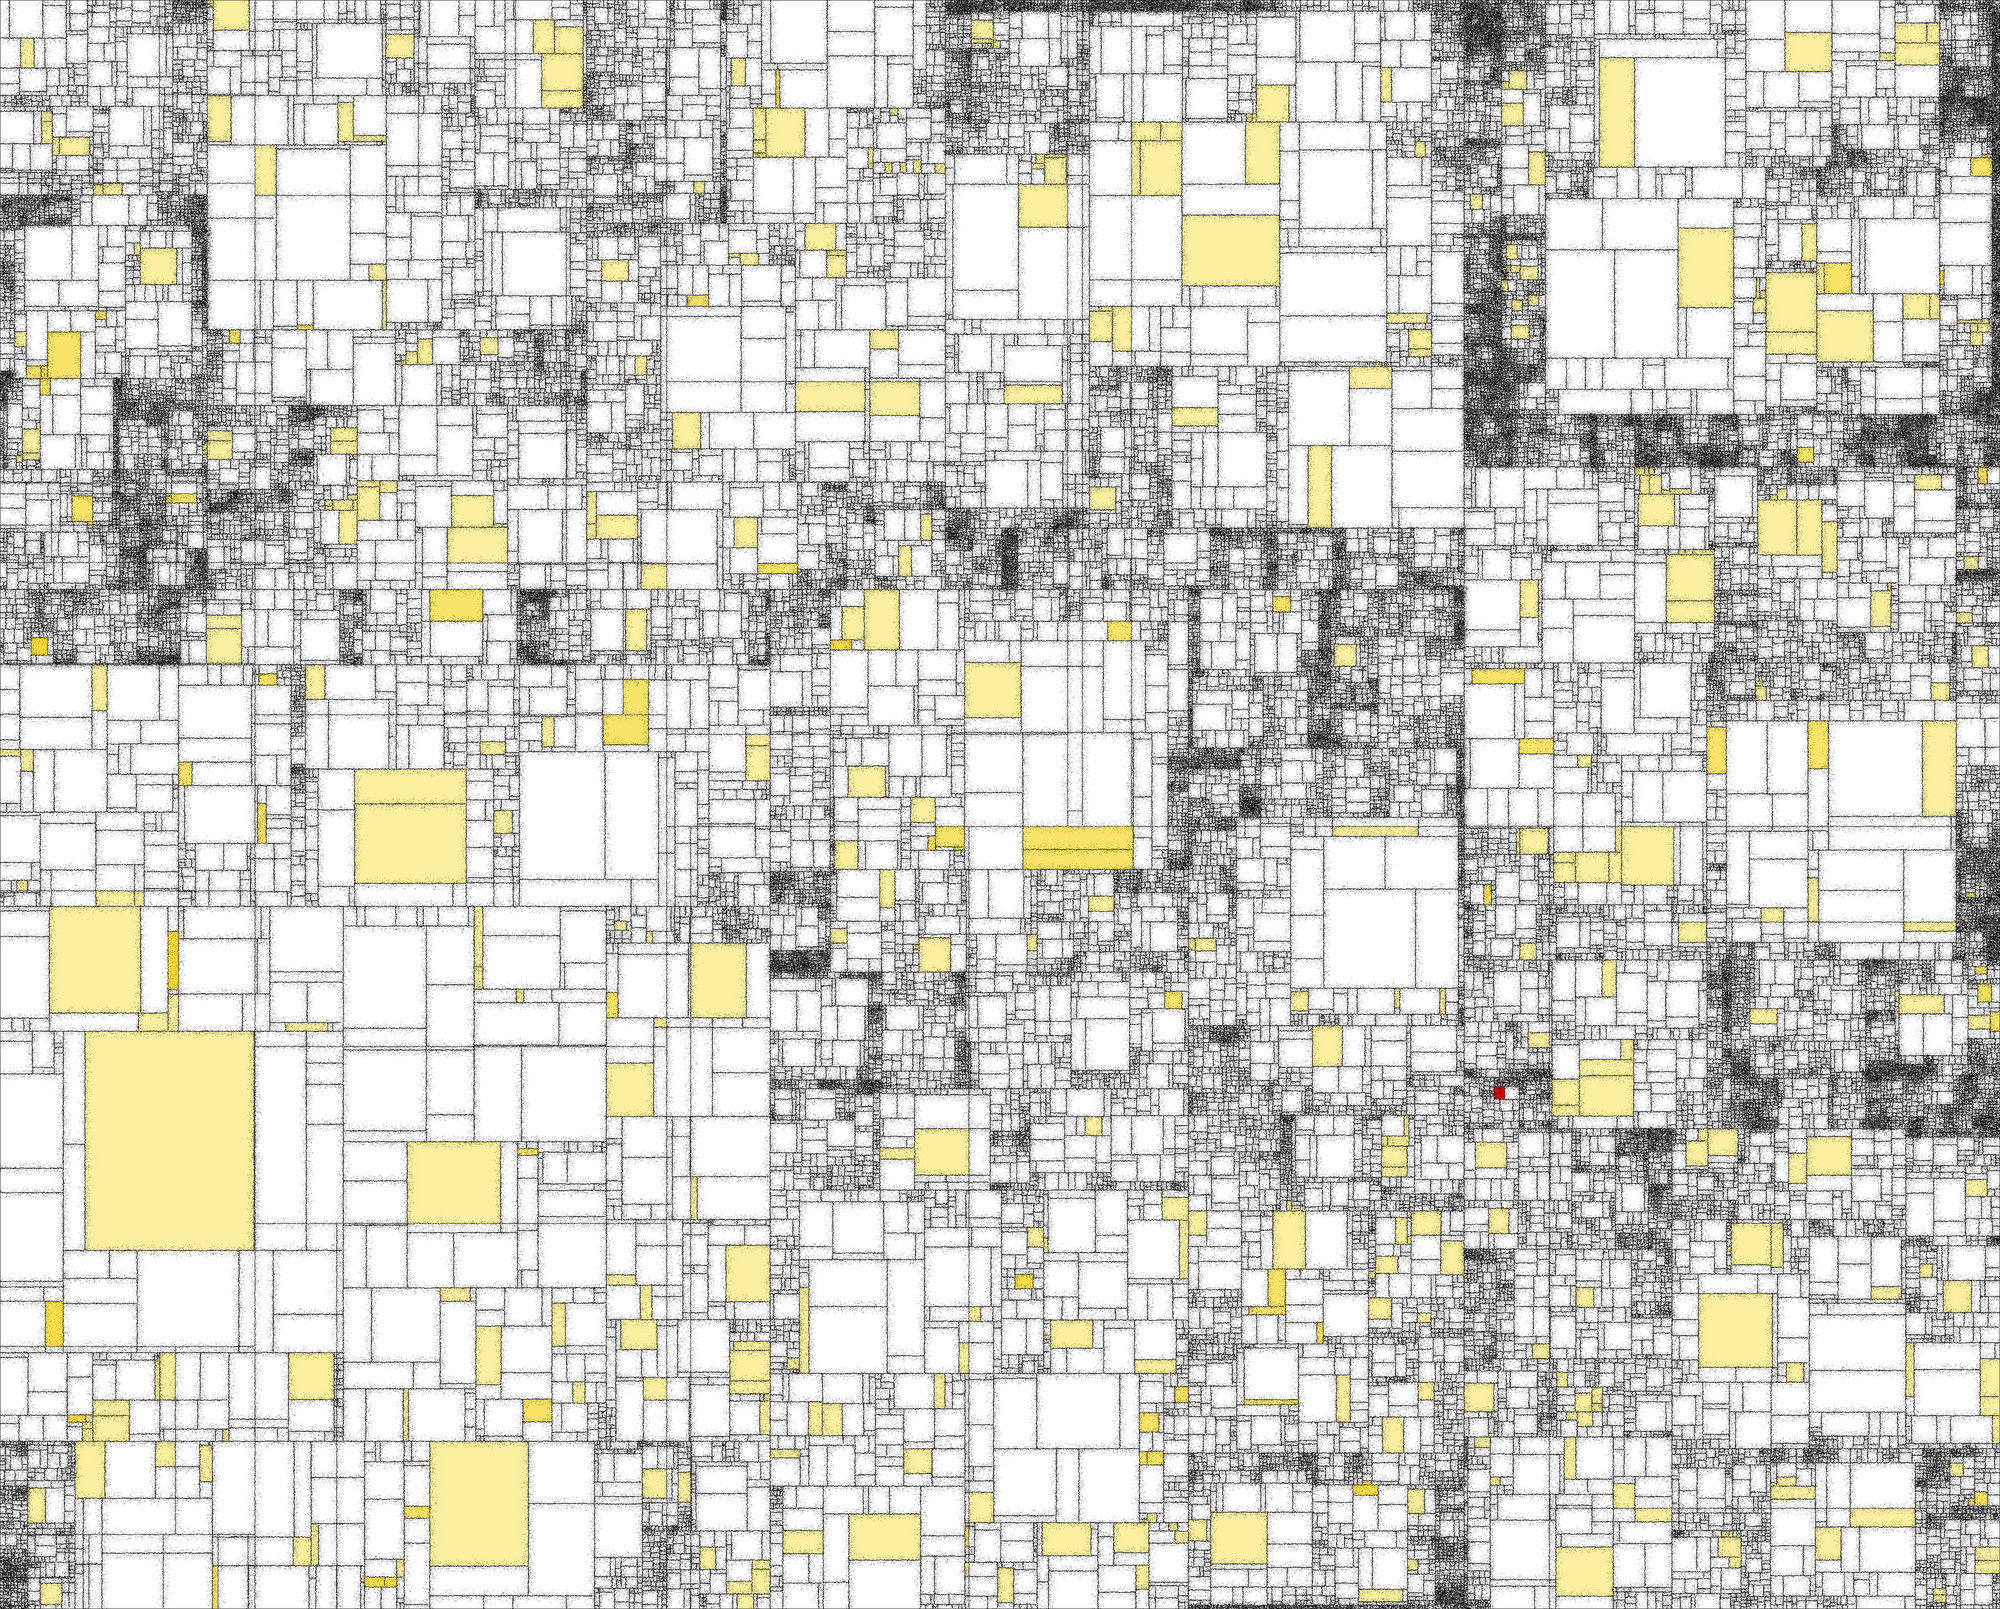 Mondrian reversed at Art Amersfoort 2015